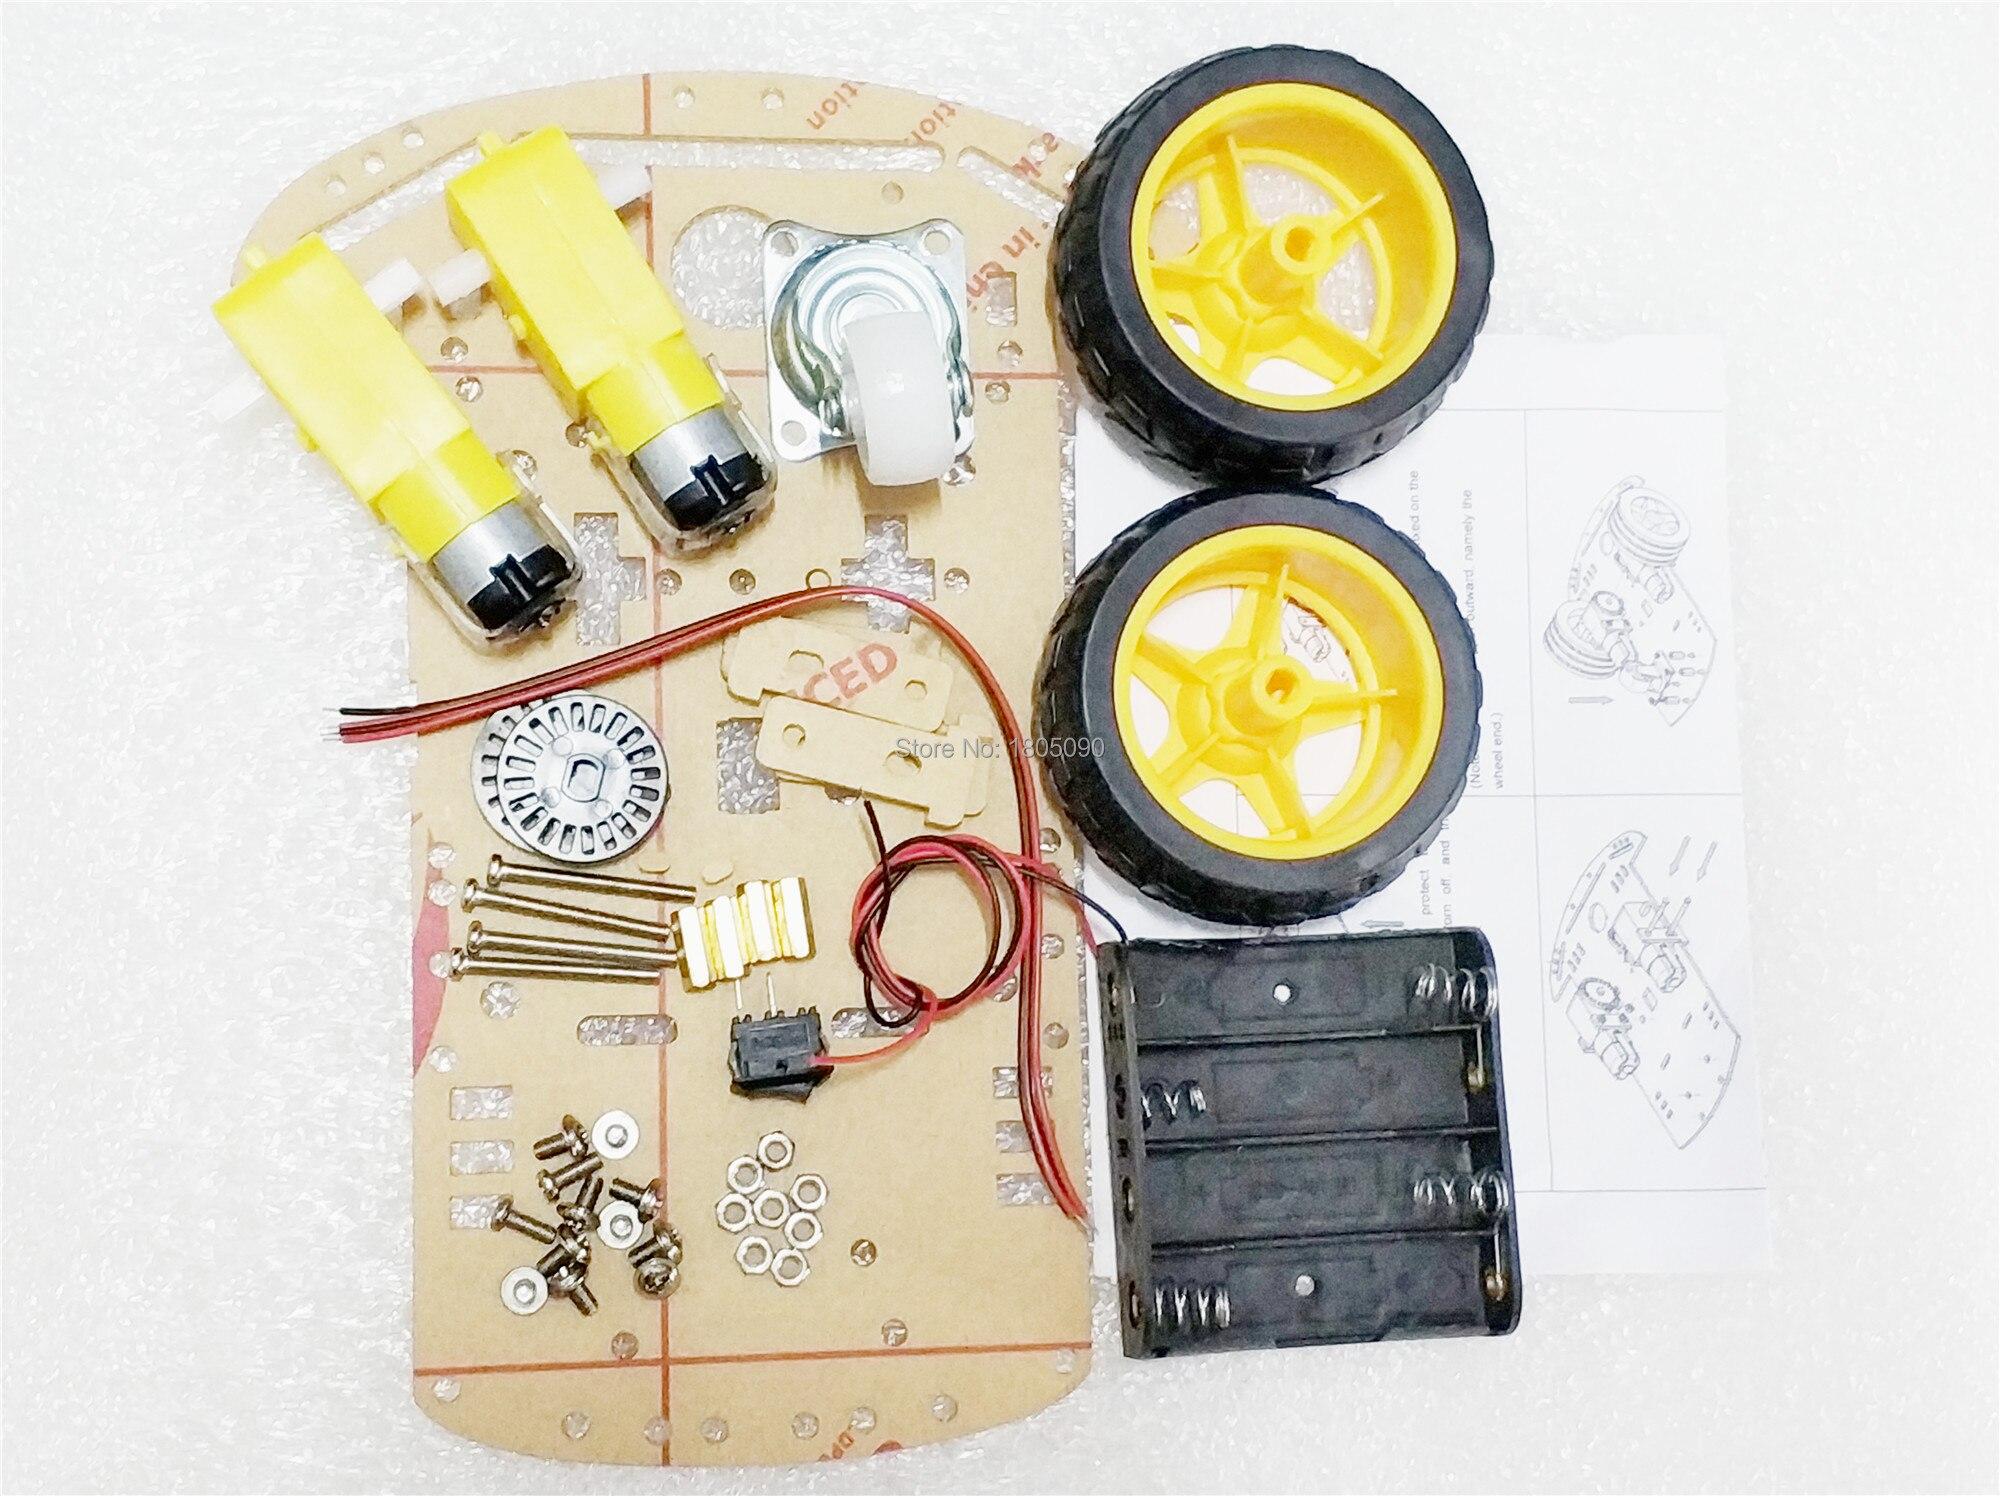 1/set DC3-6V TT motor 125 rpm 2WD smart robot car chassis kit / Smart car wheels for Arduino DIY Kit